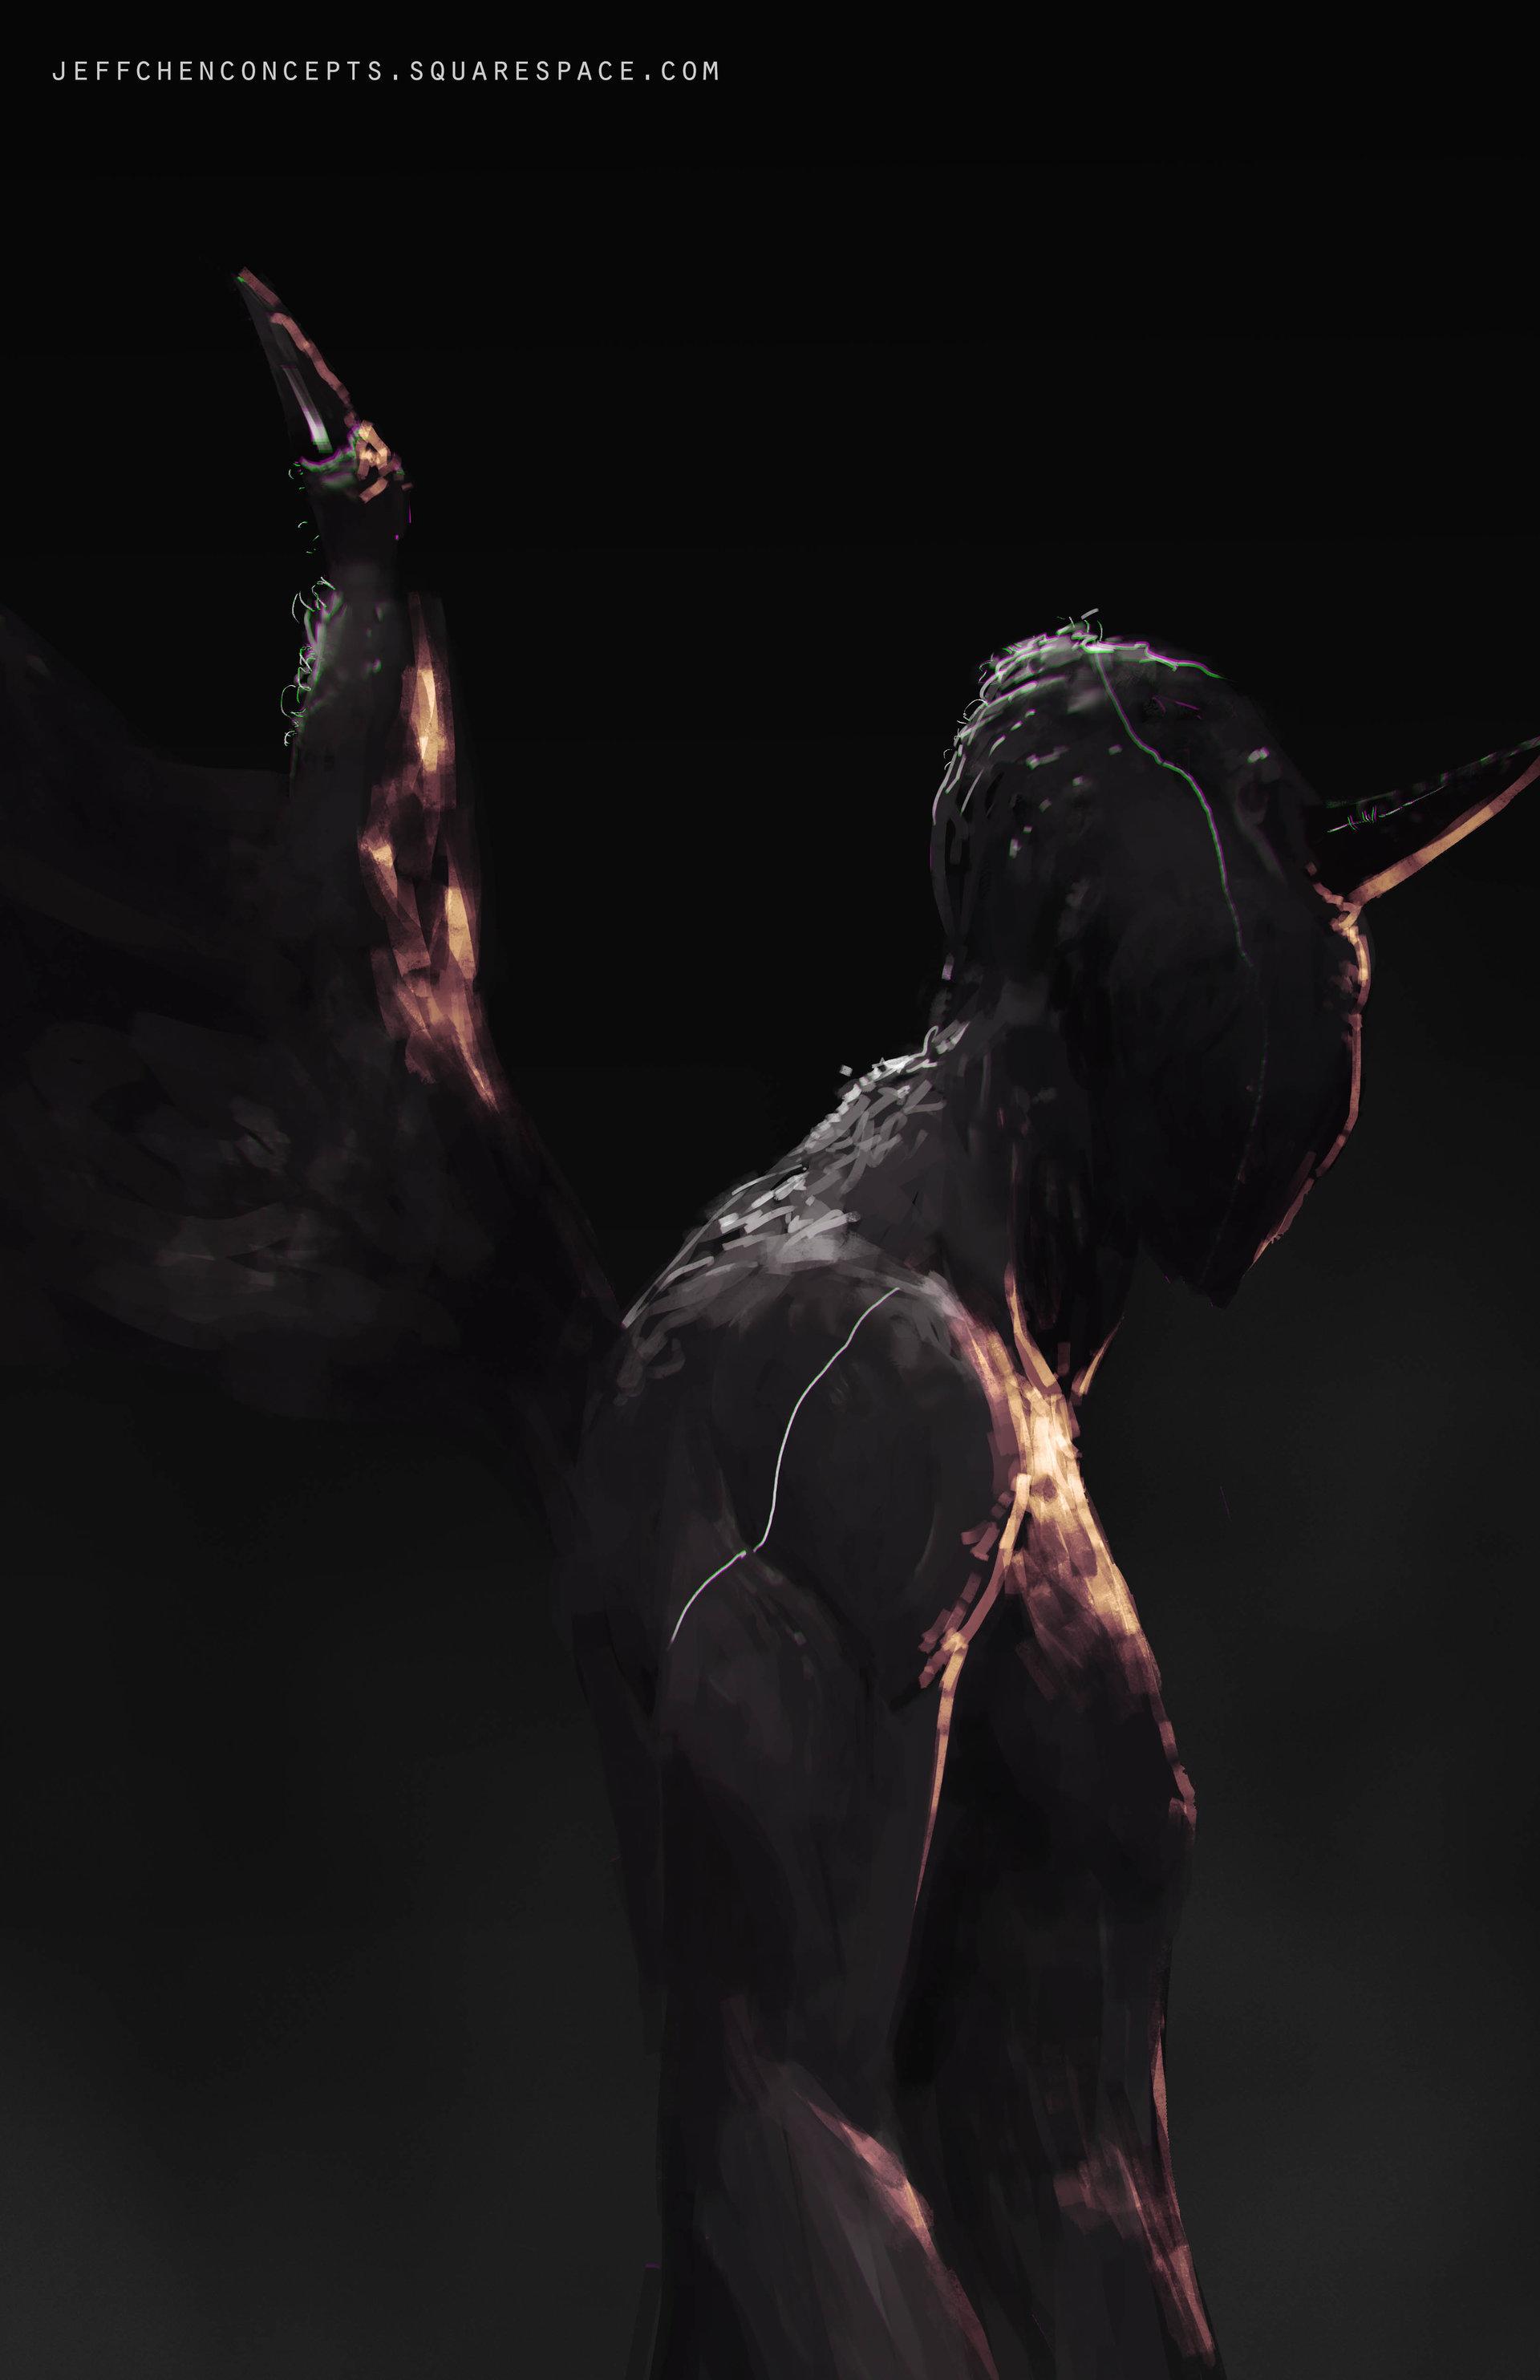 Jeff chen demon lighting